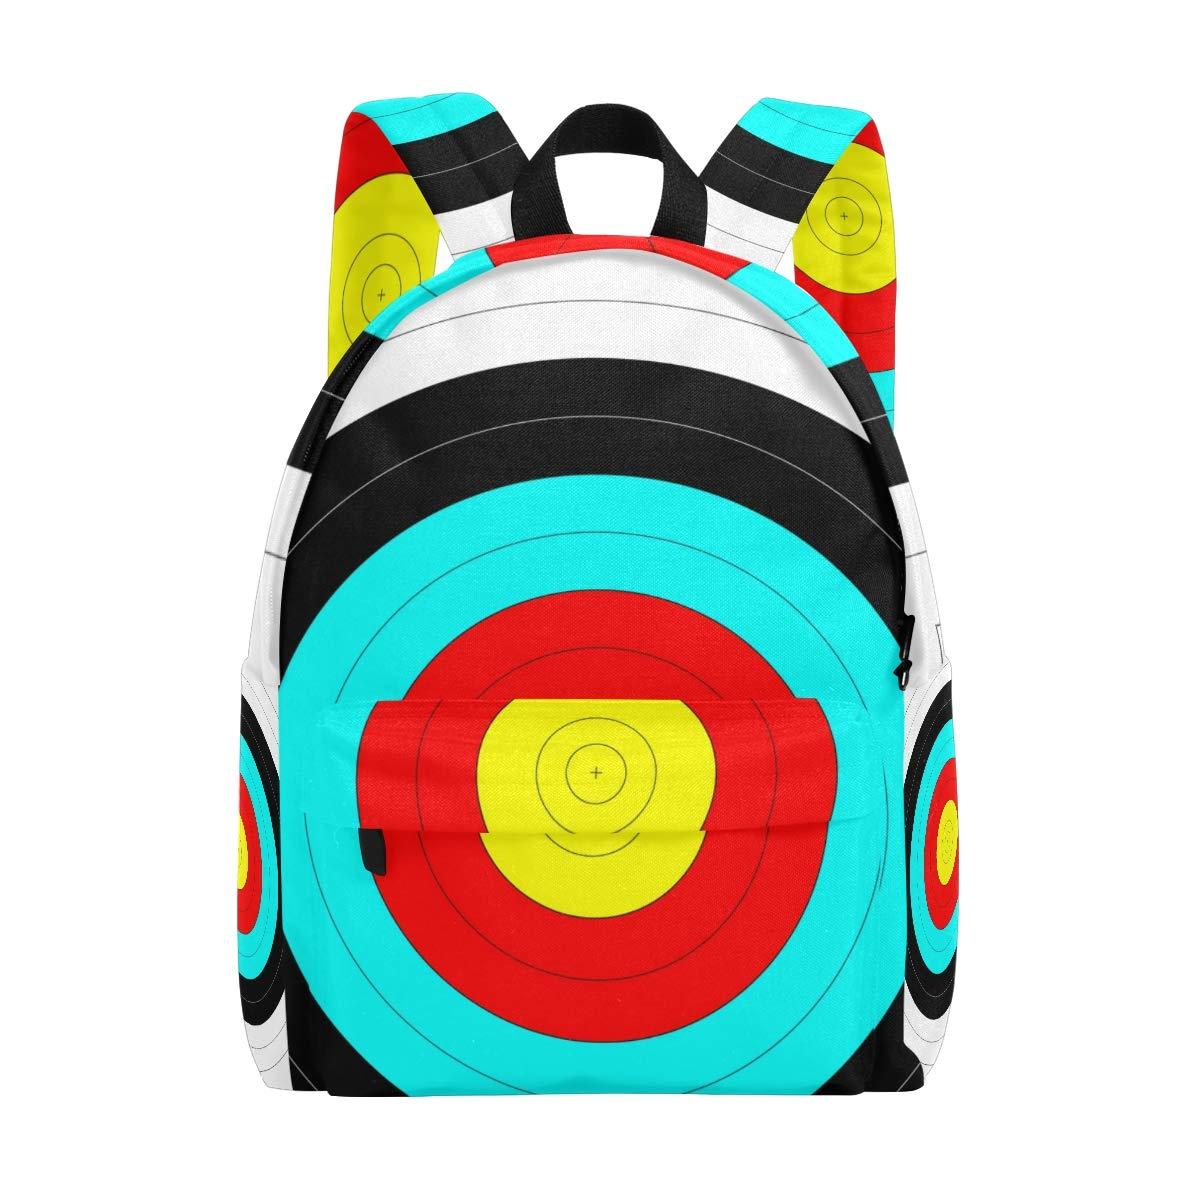 Simple Art Circle Score Archery Target Backpack Shoulder Travel School Bag Daypack Rucksack by LONK